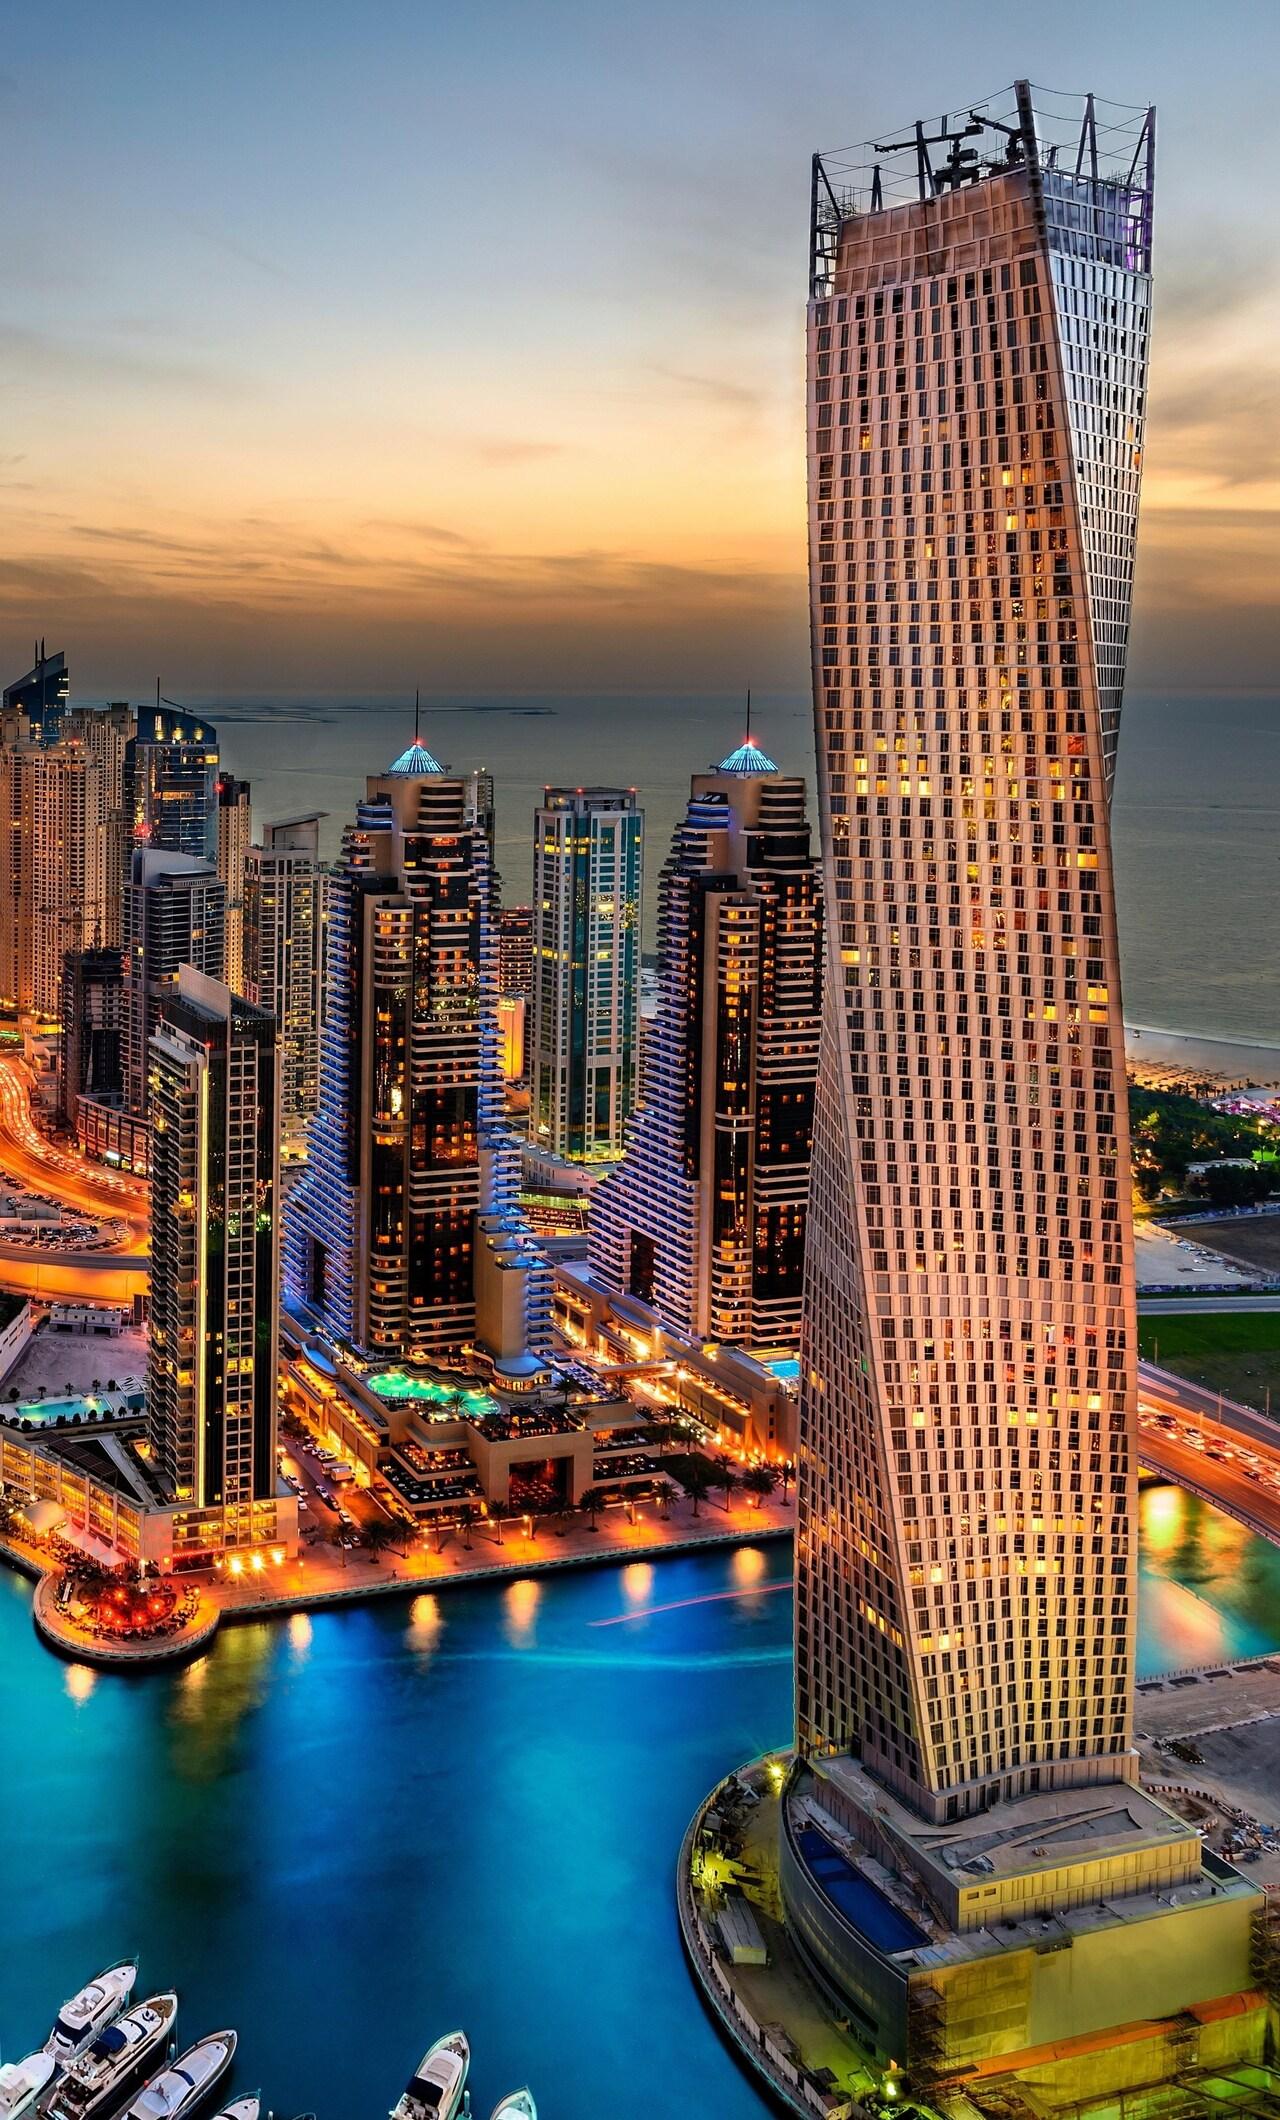 1280x2120 Dubai Uae Building Skyscrappers Night iPhone 6 ...